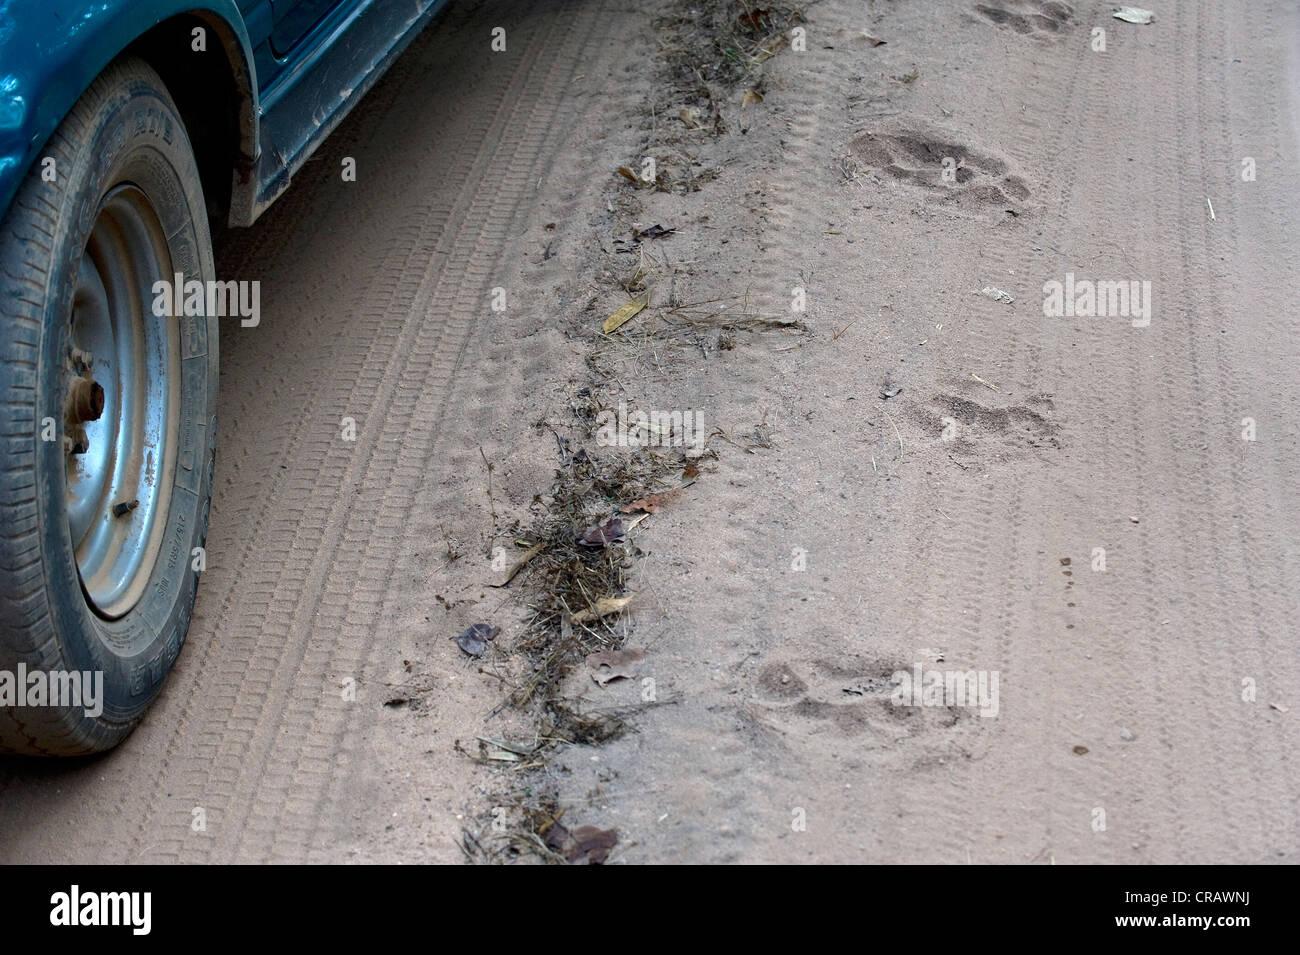 Tiger tracks next to a jeep, Bandhavgarh National Park, Madhya Pradesh, India, Asia - Stock Image